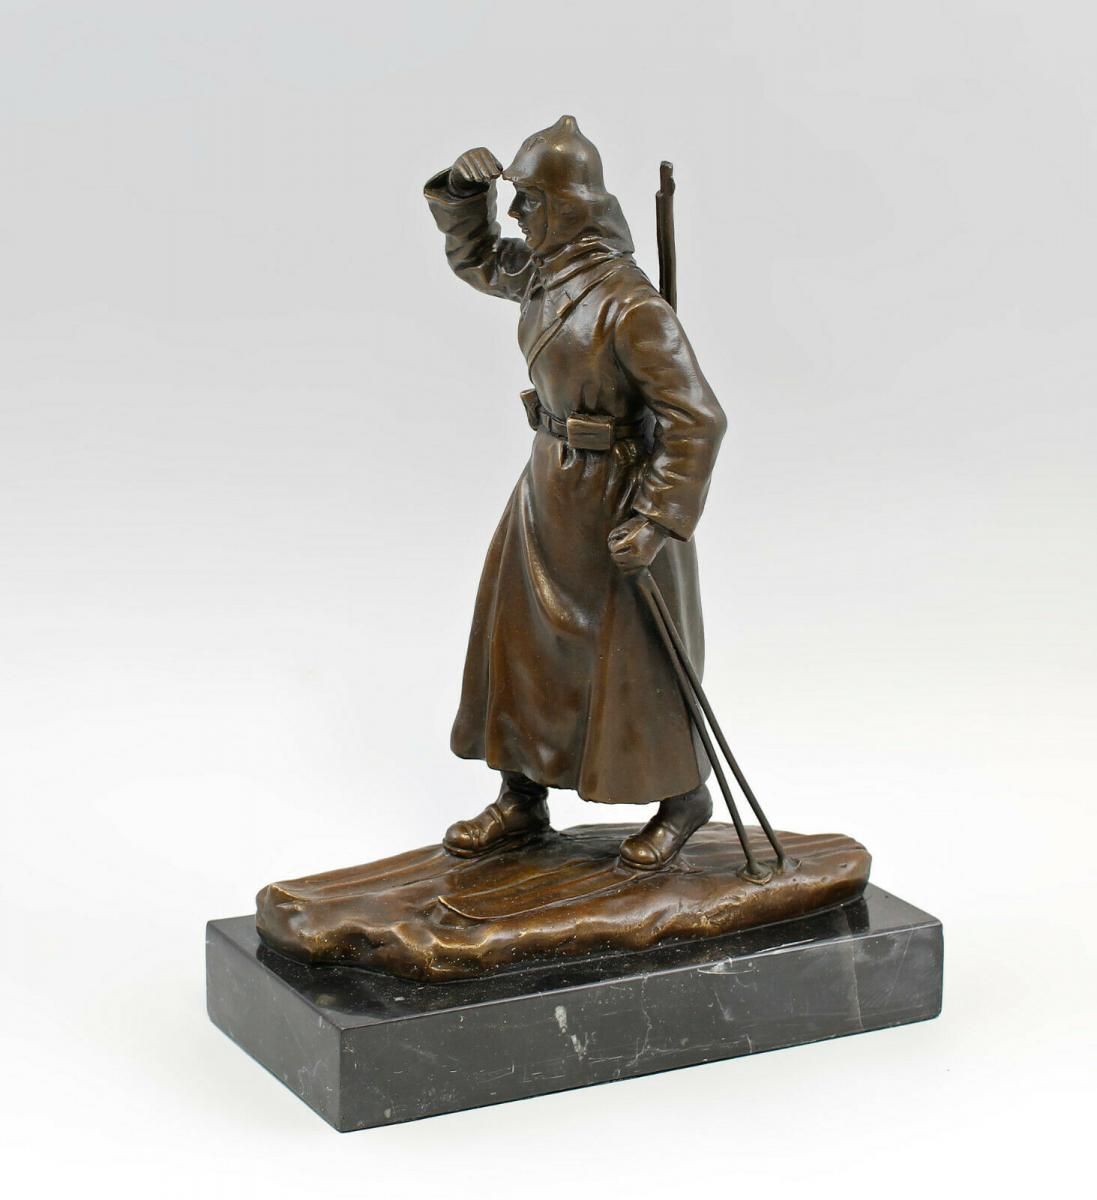 9937973-dss große Bronze Skulptur Figur Soldat auf Ski Rote Armee 2